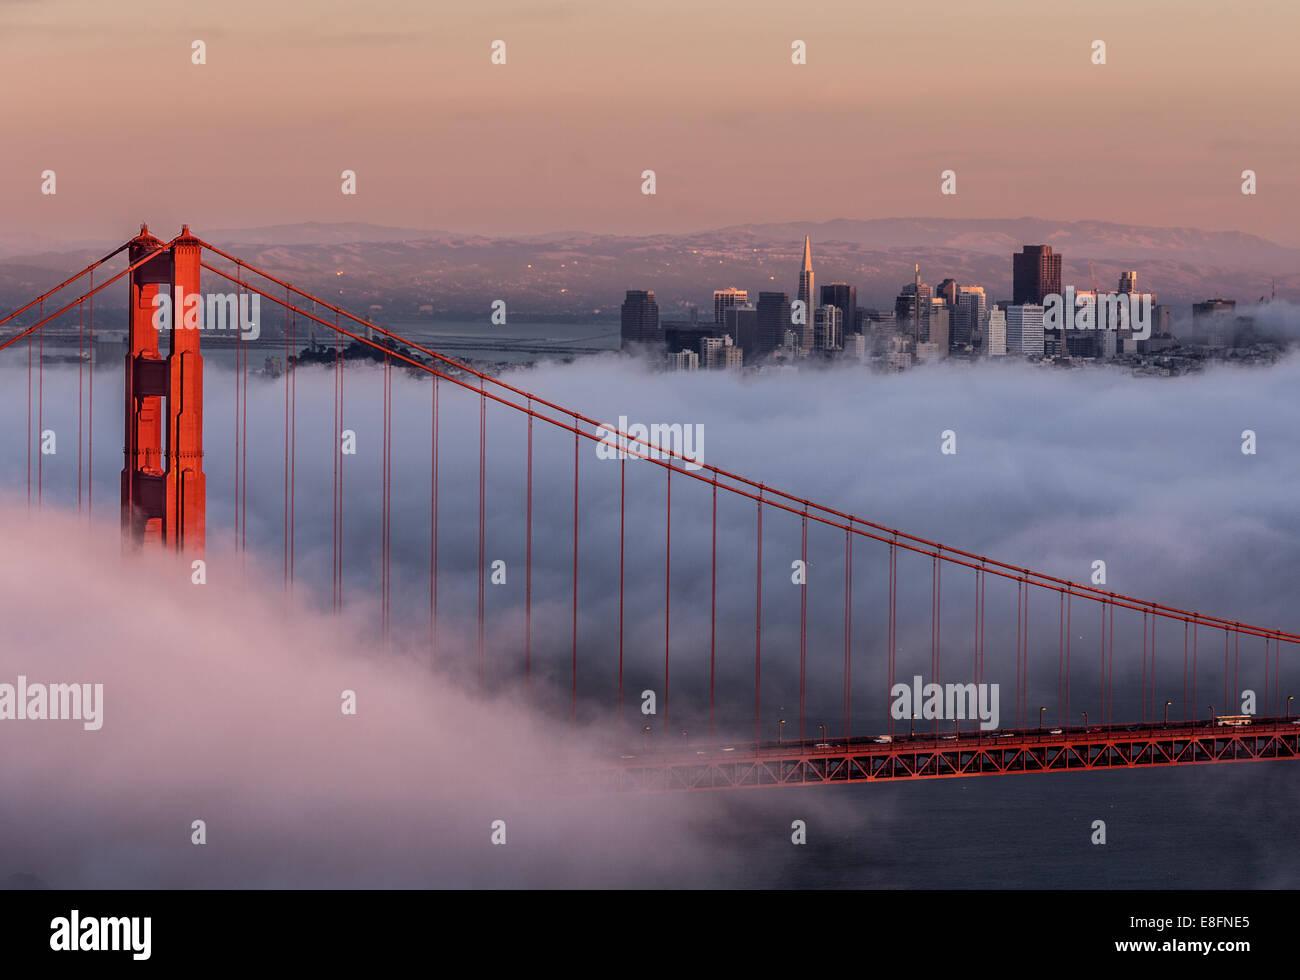 USA, California, San Francisco, Golden Gate and city - Stock Image